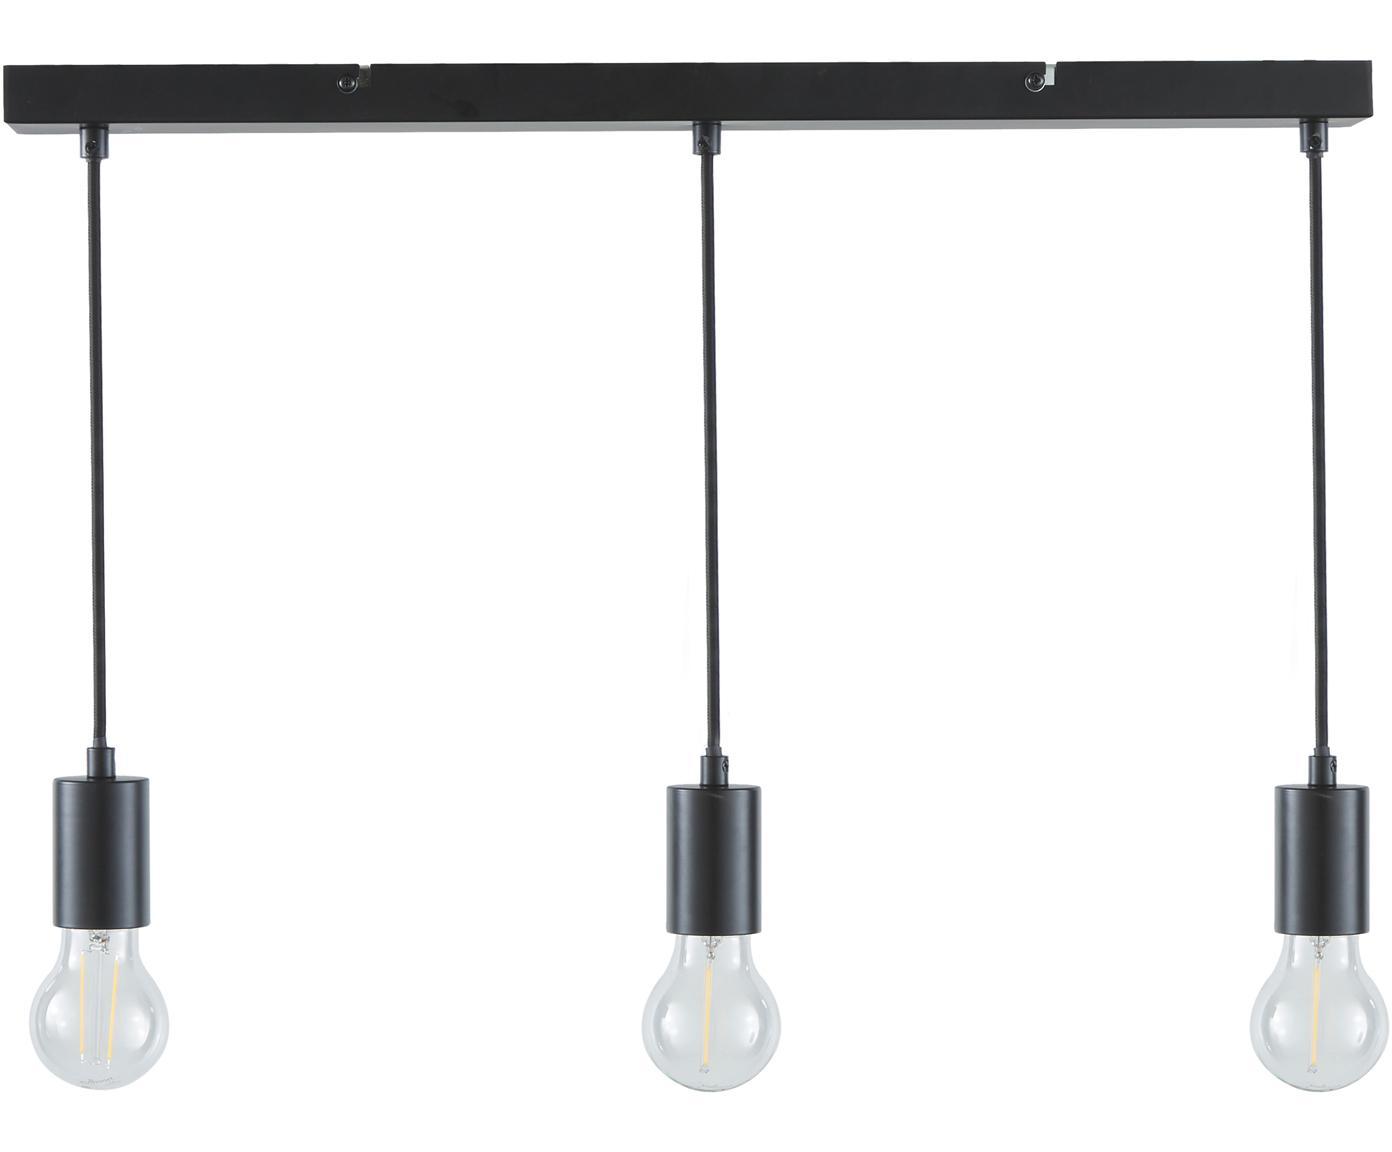 Lampada a sospensione Dina, Nero, Larg. 60 x Alt. 100 cm